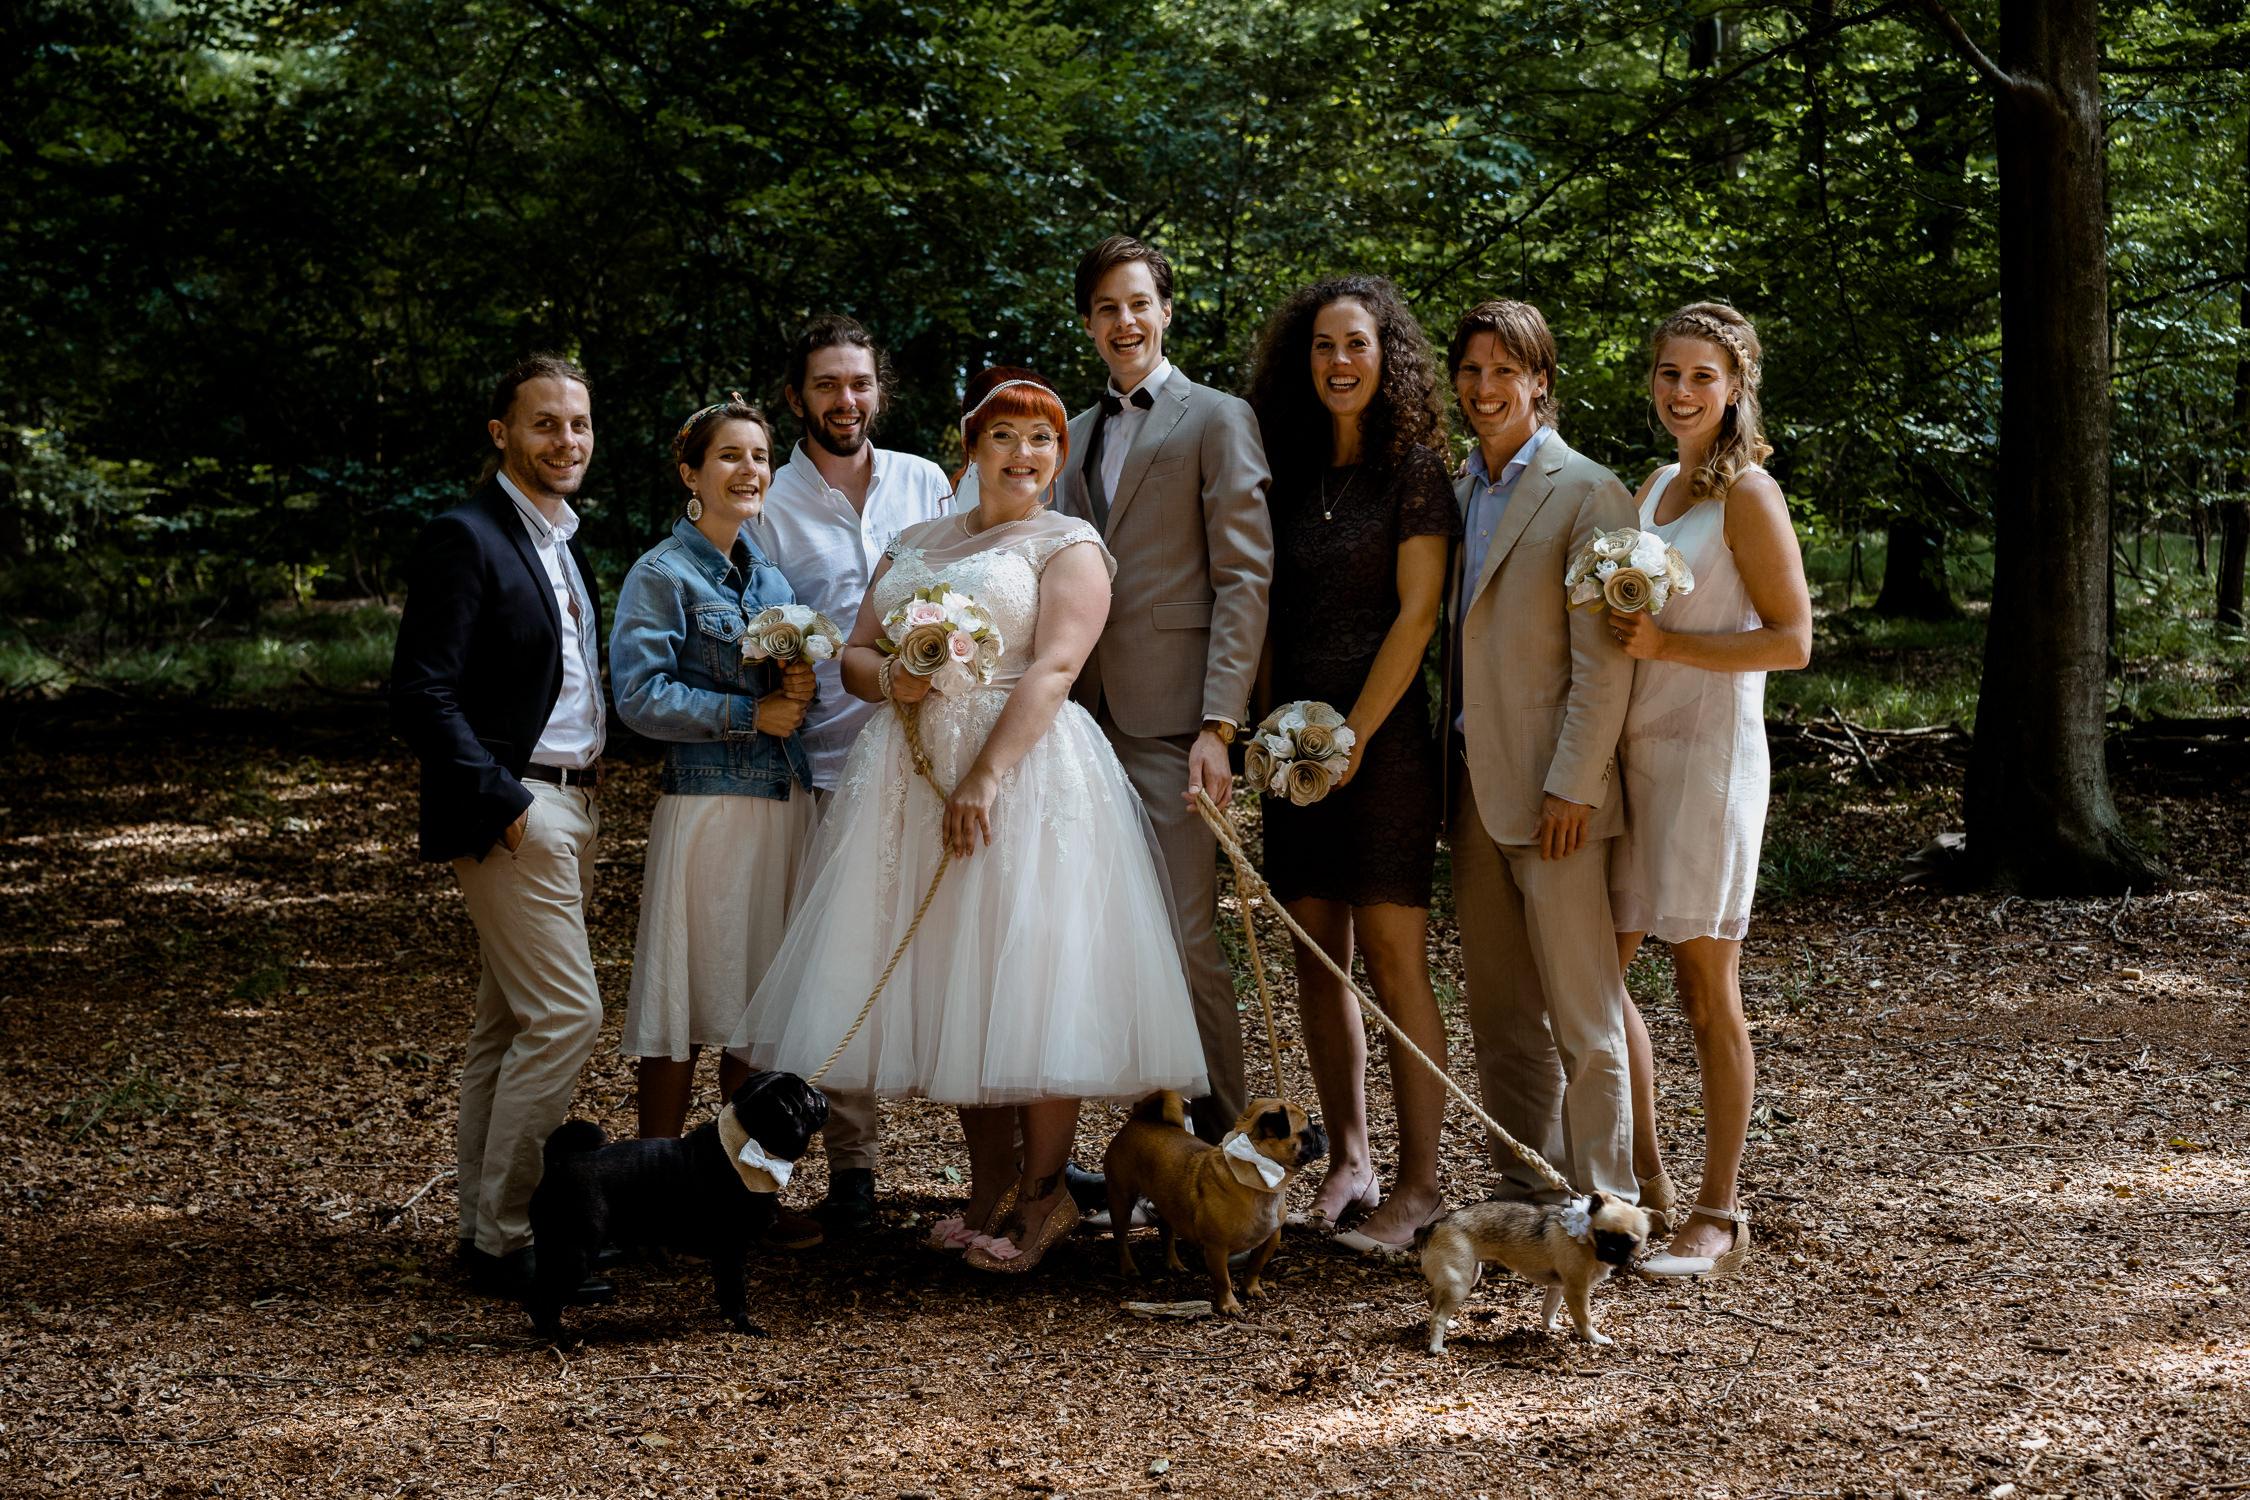 amsterdam-wedding-photographer-bruidsfotografie-trouwfotograaf-mark-hadden-Lucie-Luuk-176.jpg